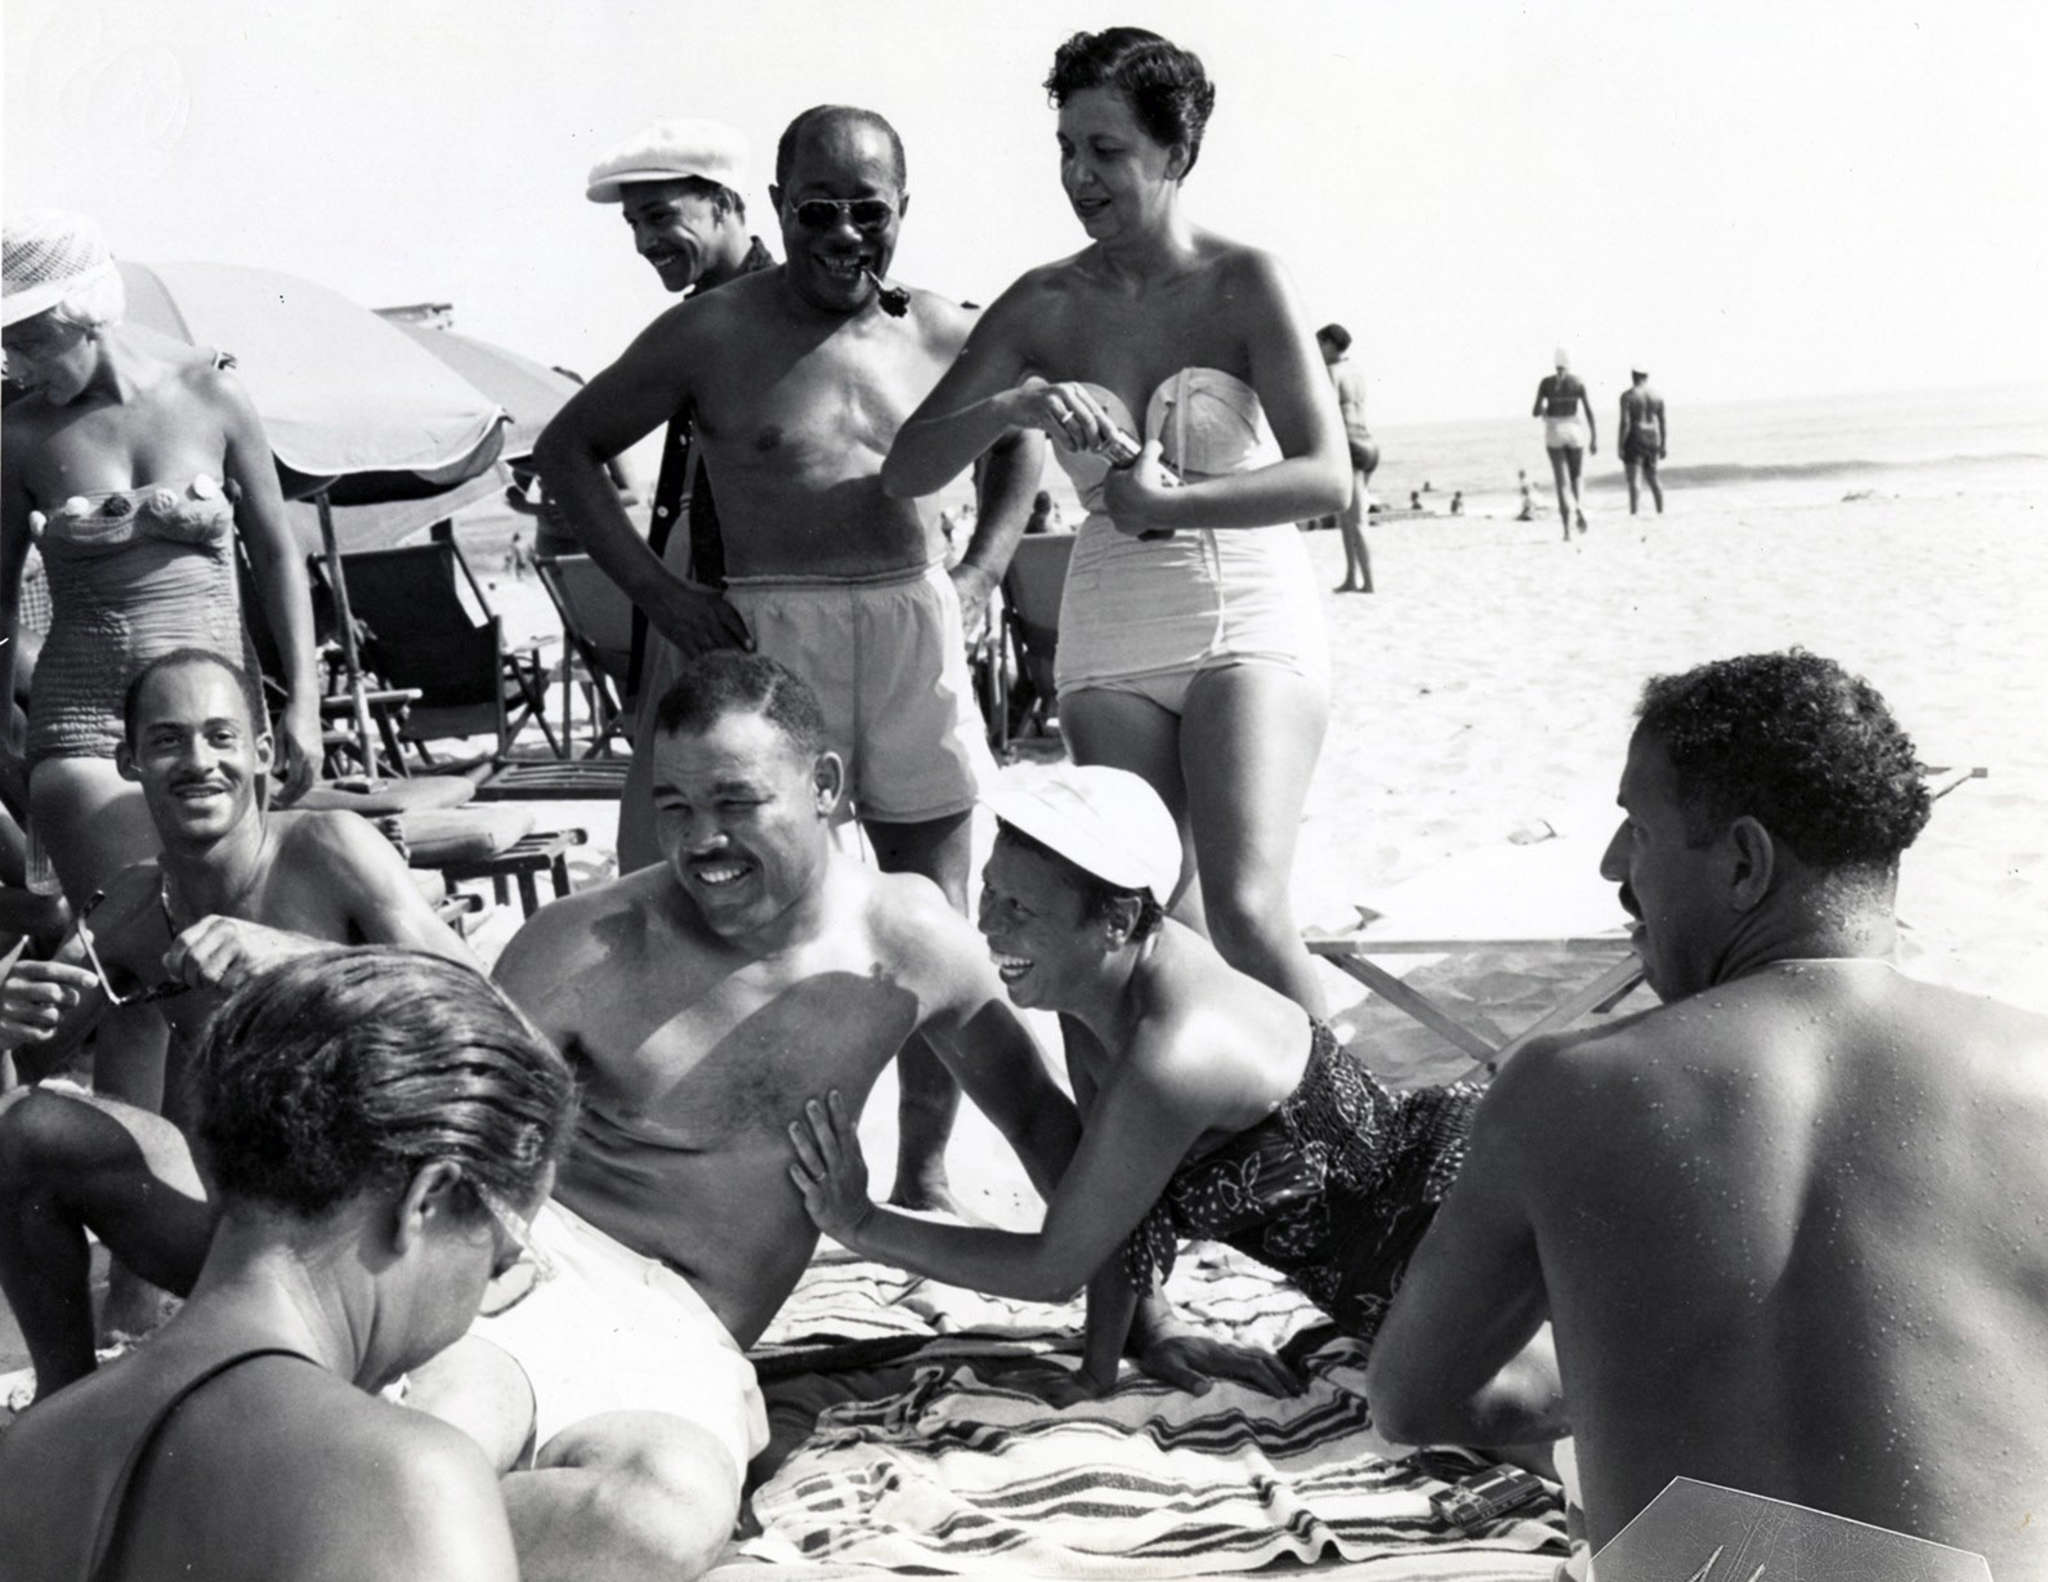 Heavyweight boxing champion Joe Louis (center) with friends on Chicken Bone Beach, Atlantic City (1952).